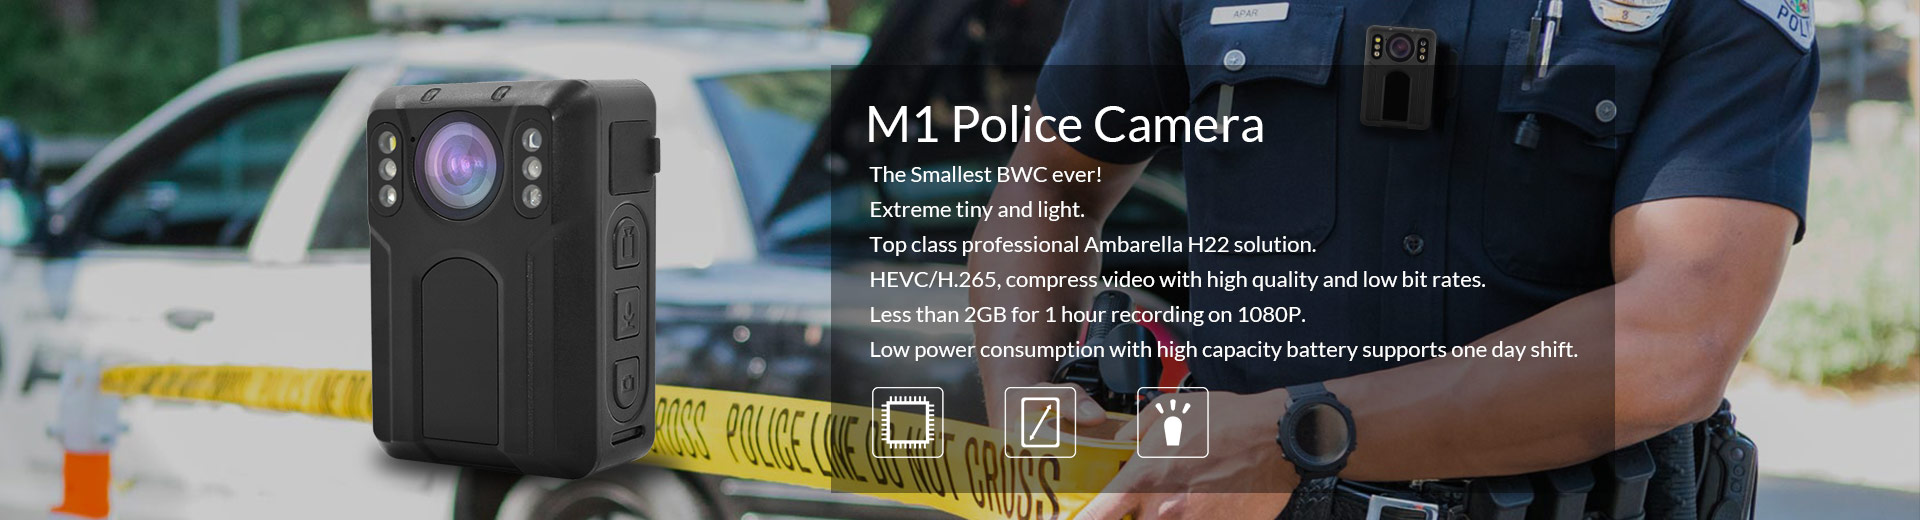 M1 Police Camera